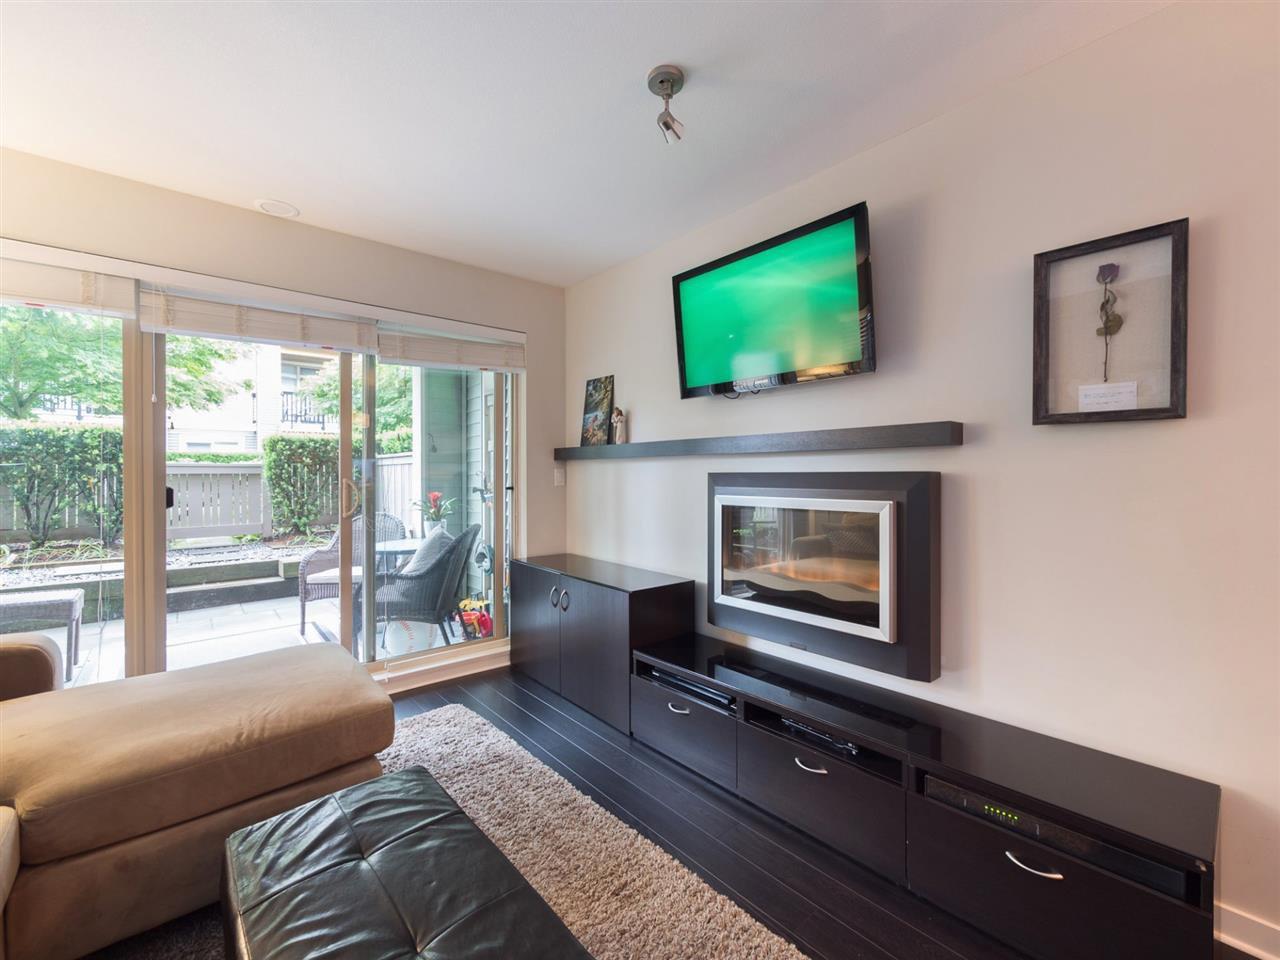 "Photo 6: Photos: 116 21009 56 Avenue in Langley: Salmon River Condo for sale in ""CORNERSTONE"" : MLS®# R2296673"